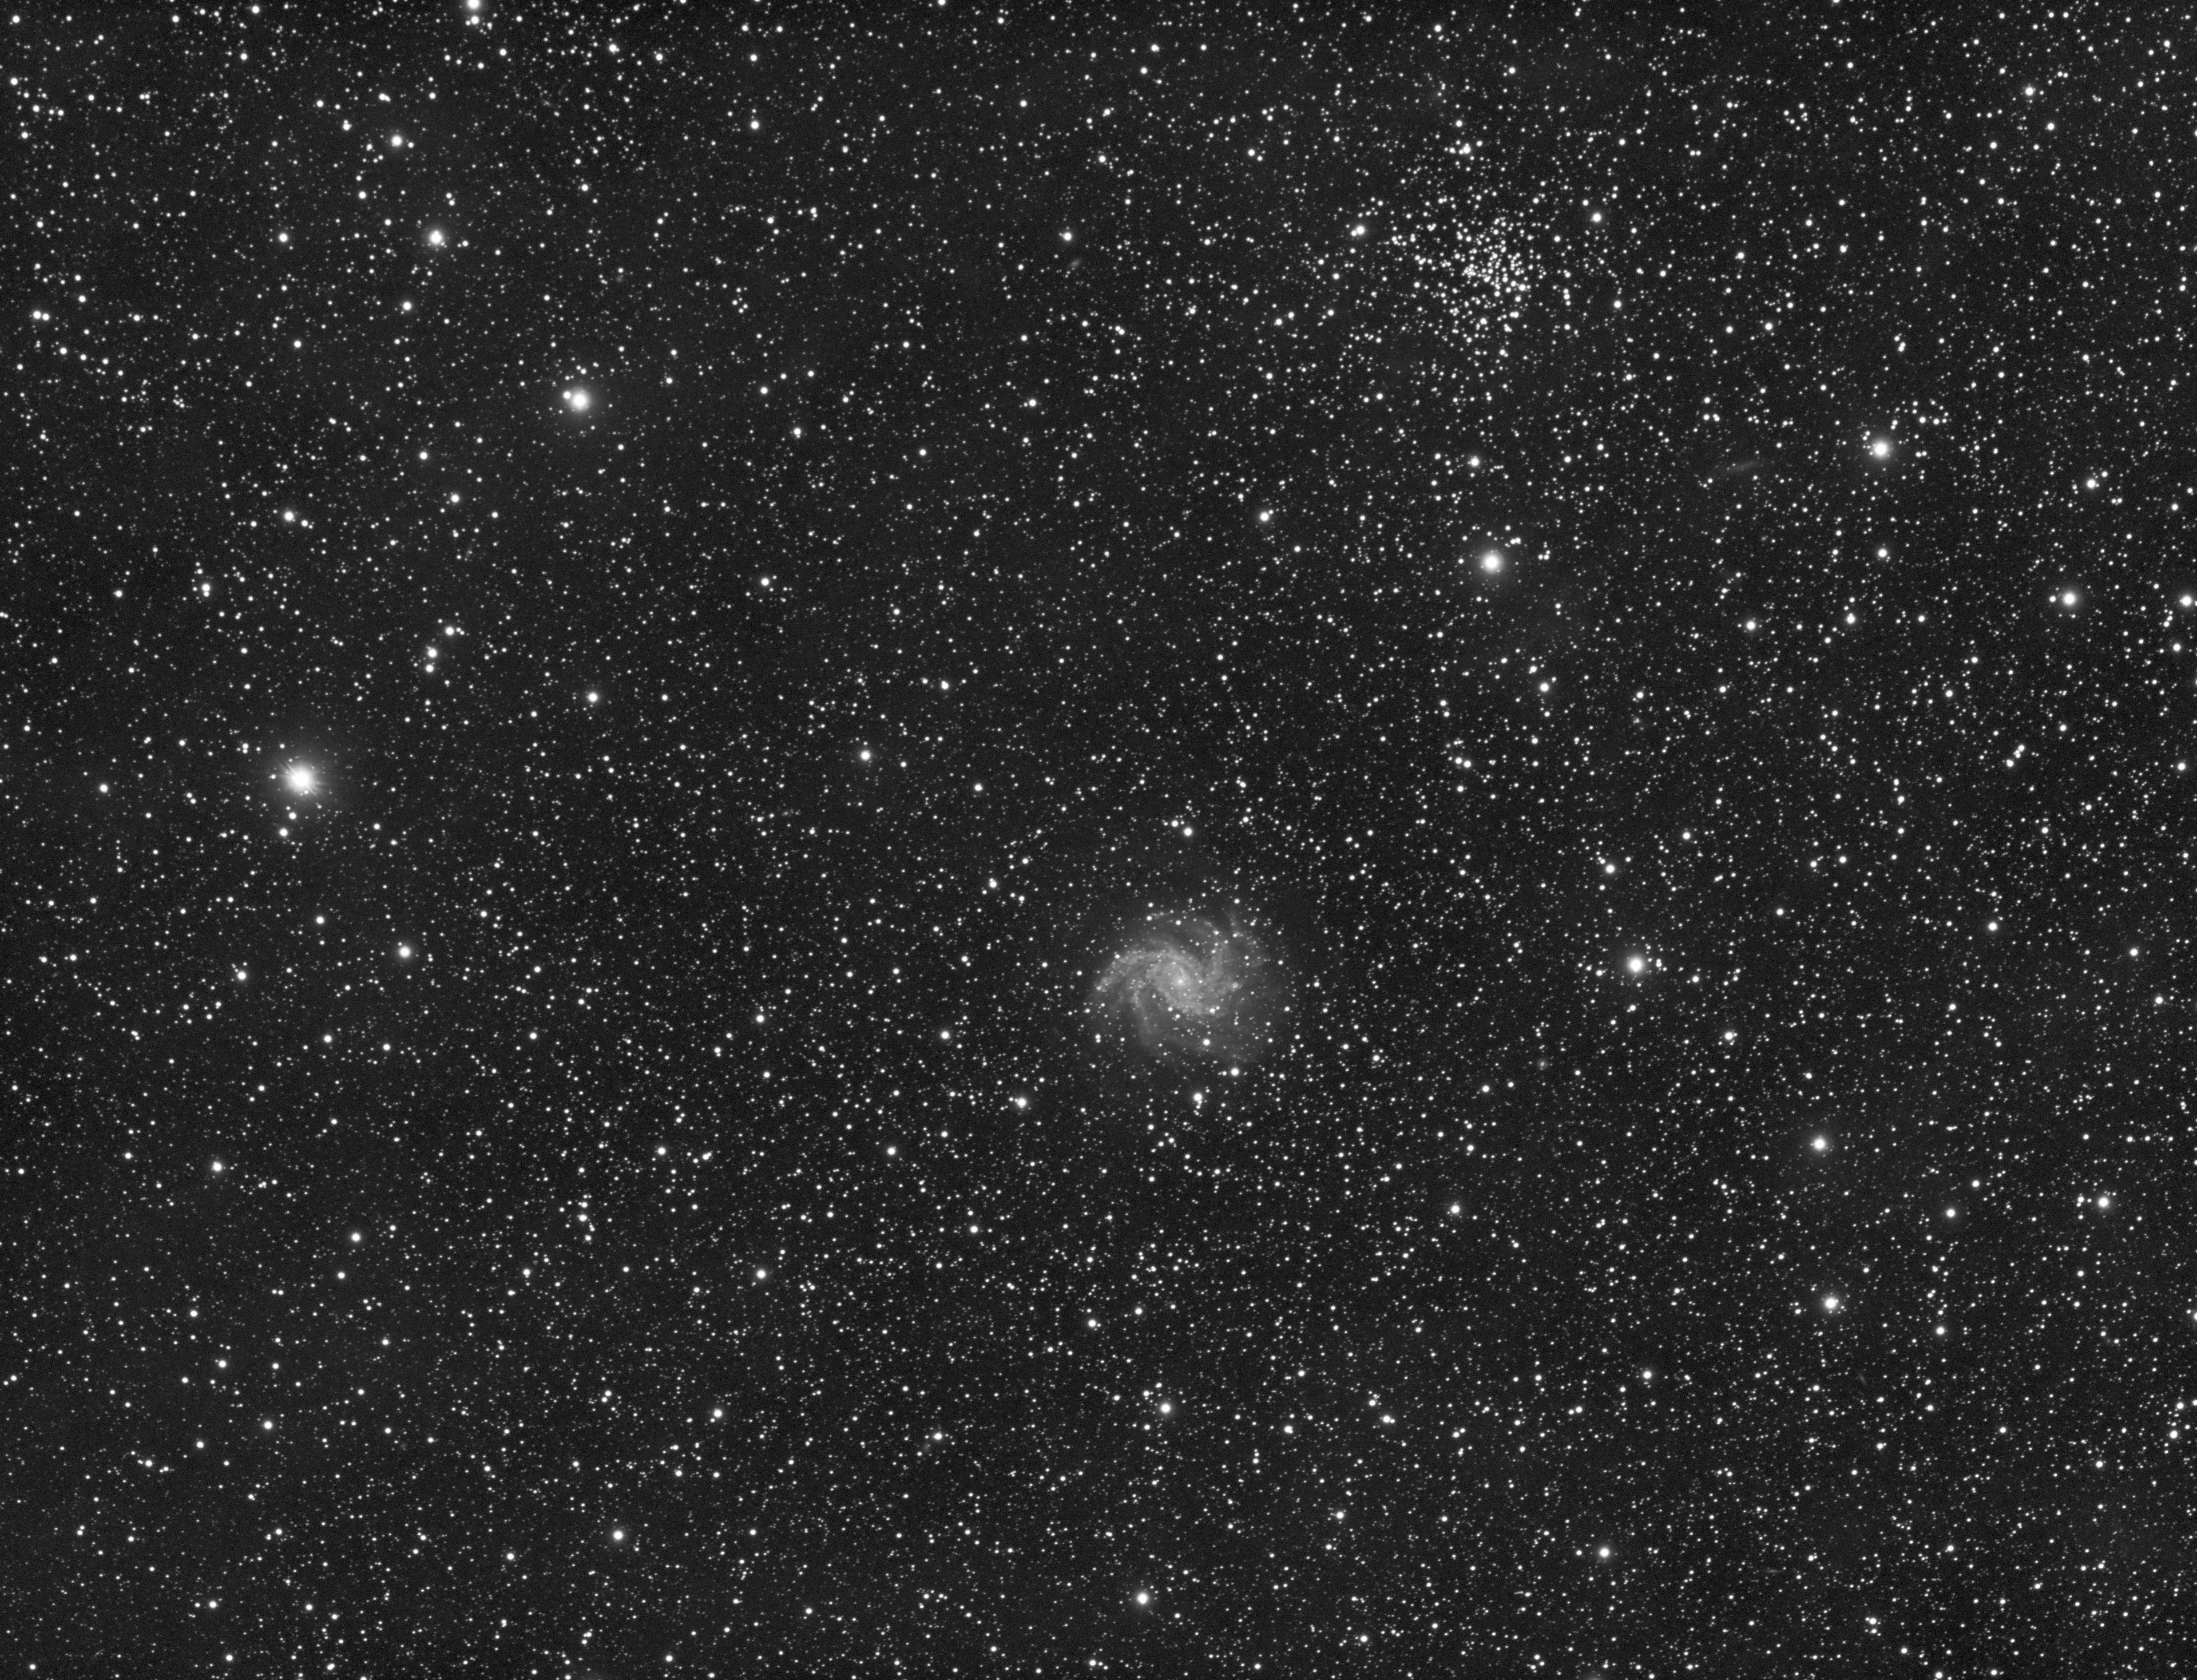 NGC6946_ASI1600_39x90s_Gain200_offset60x2.jpg